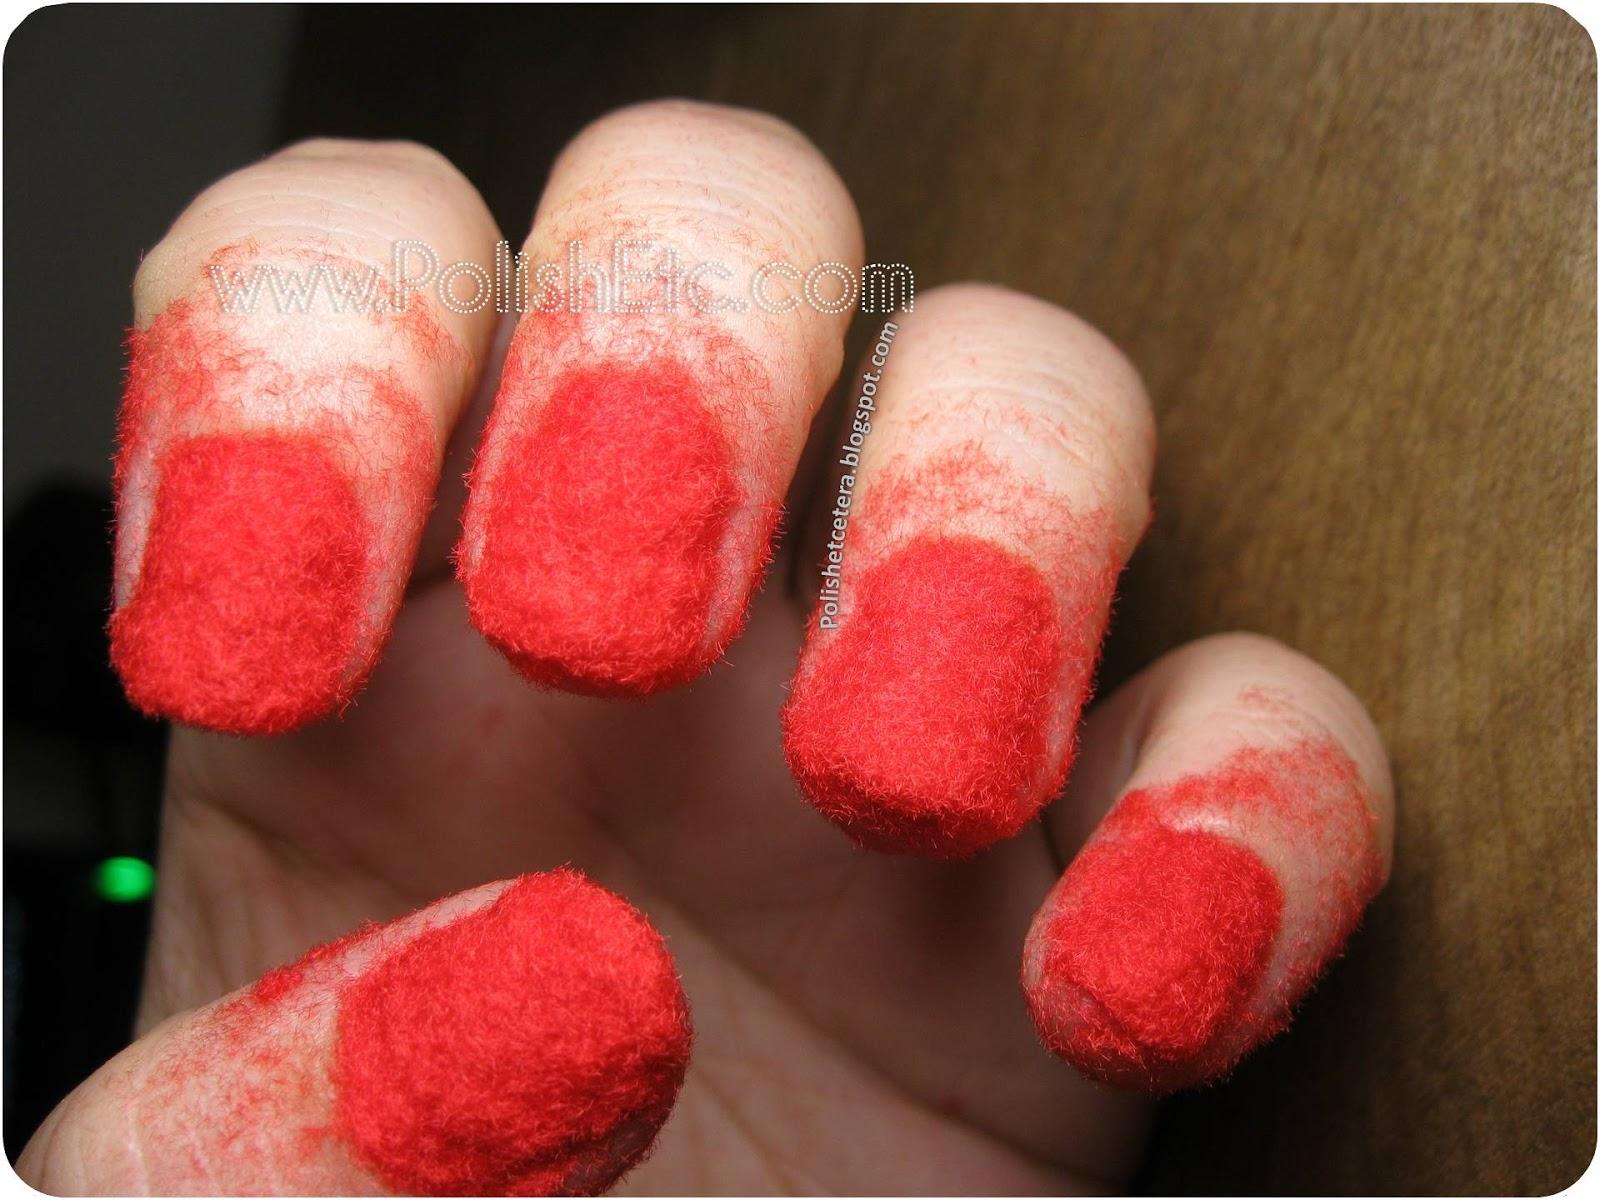 Fuzzy Red Sweater Nails! - Polish Etc.